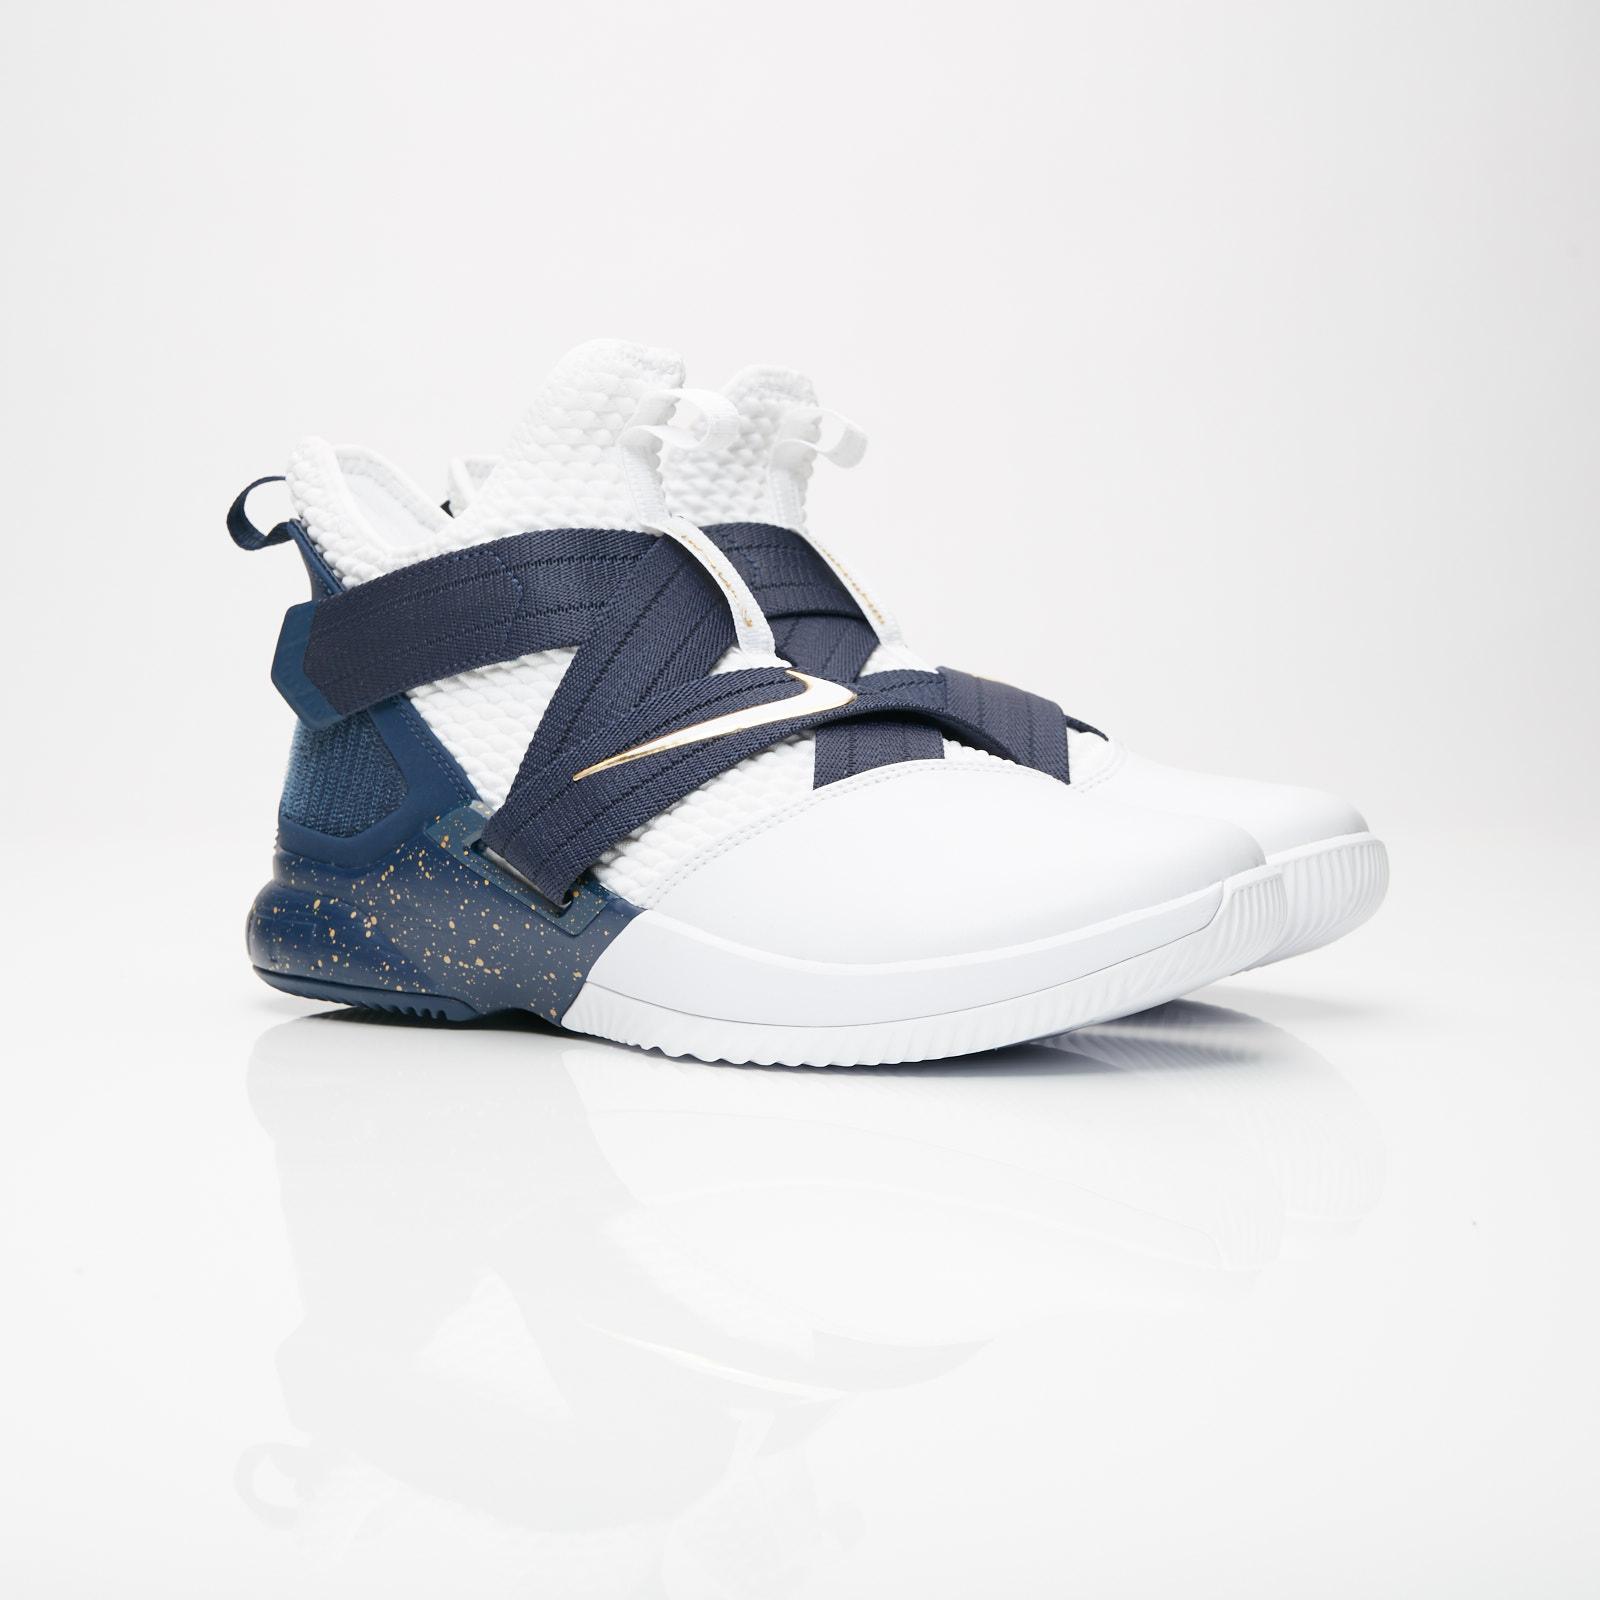 size 40 abeea 09ef5 Nike Lebron Soldier XII SFG - Ao4054-100 - Sneakersnstuff ...